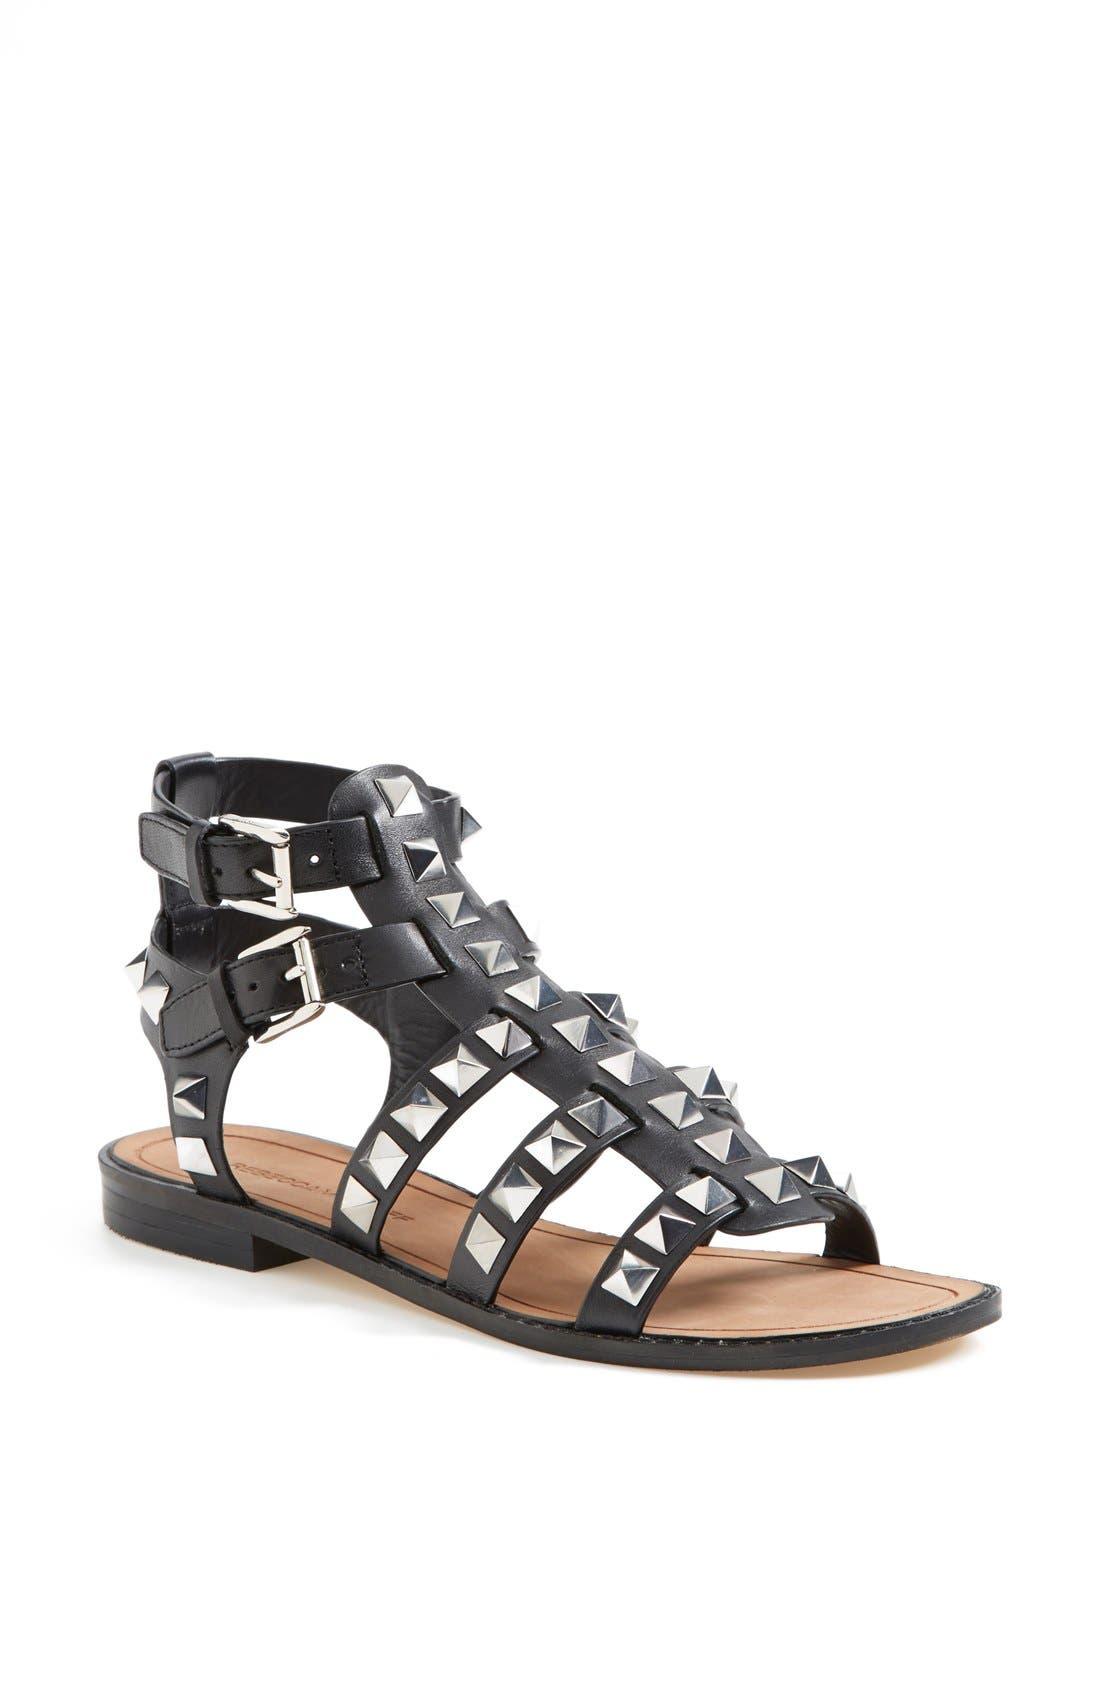 Main Image - Rebecca Minkoff 'Sage' Sandal